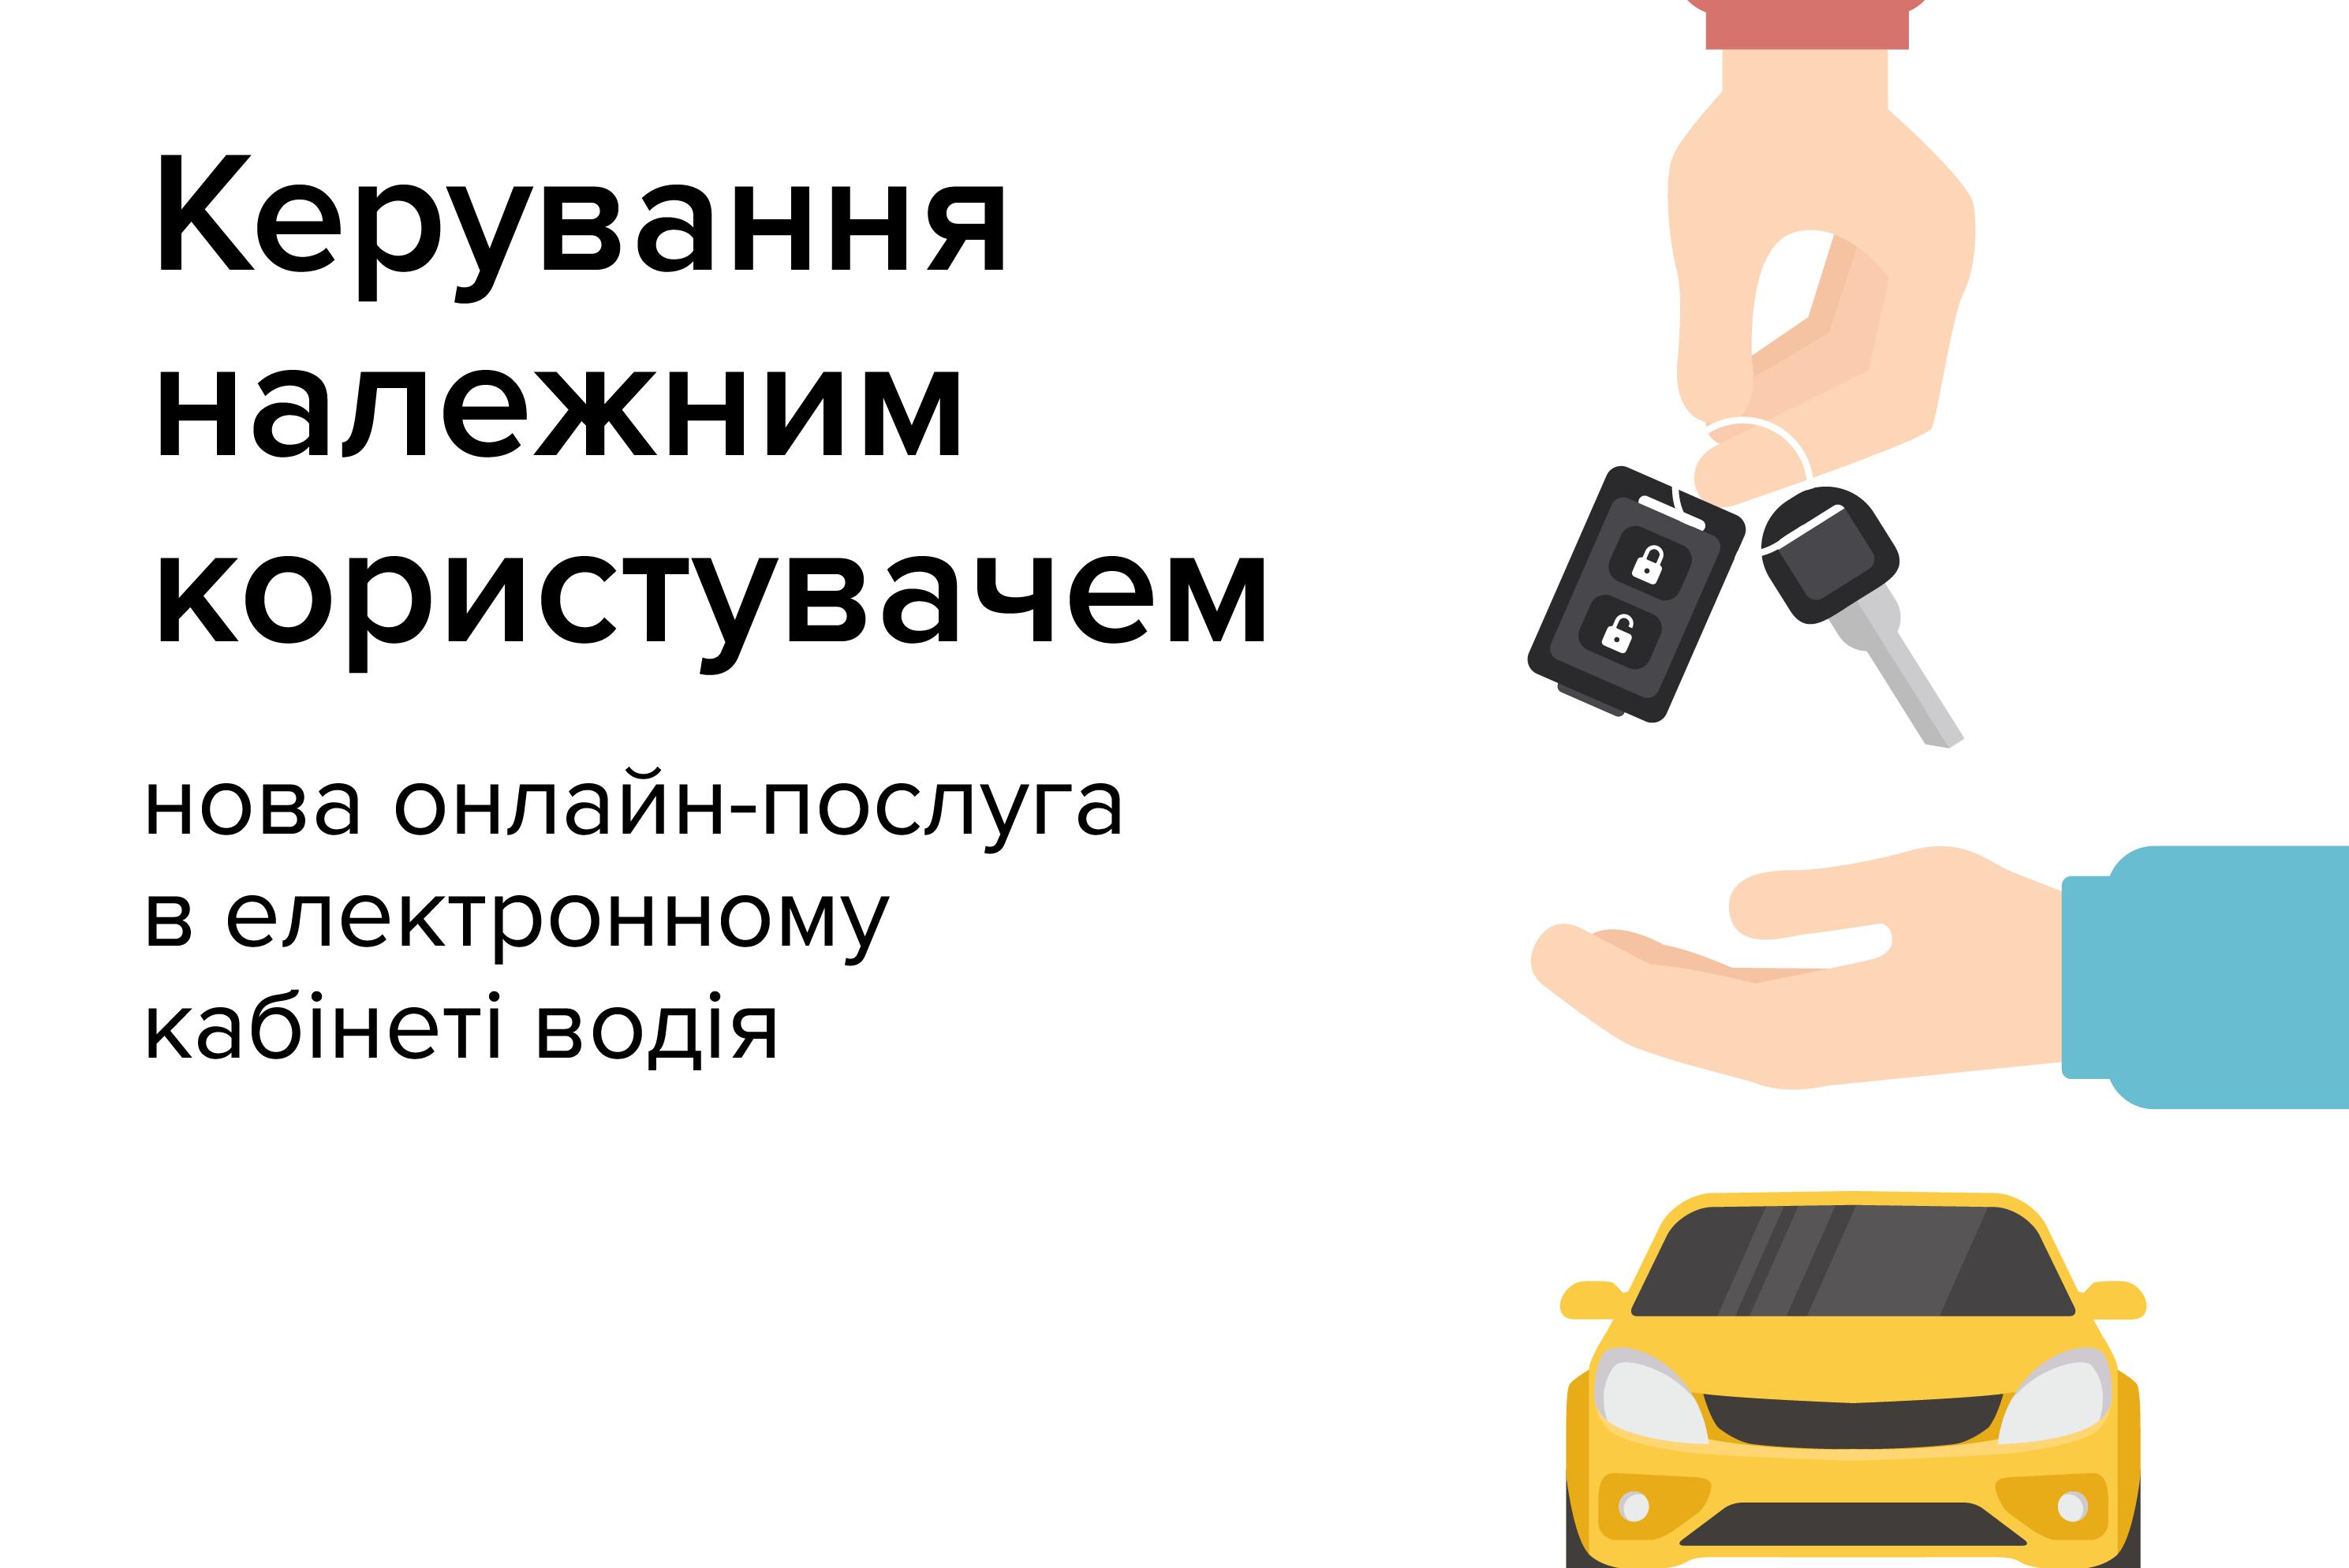 Nalezhnij_koristuvach_